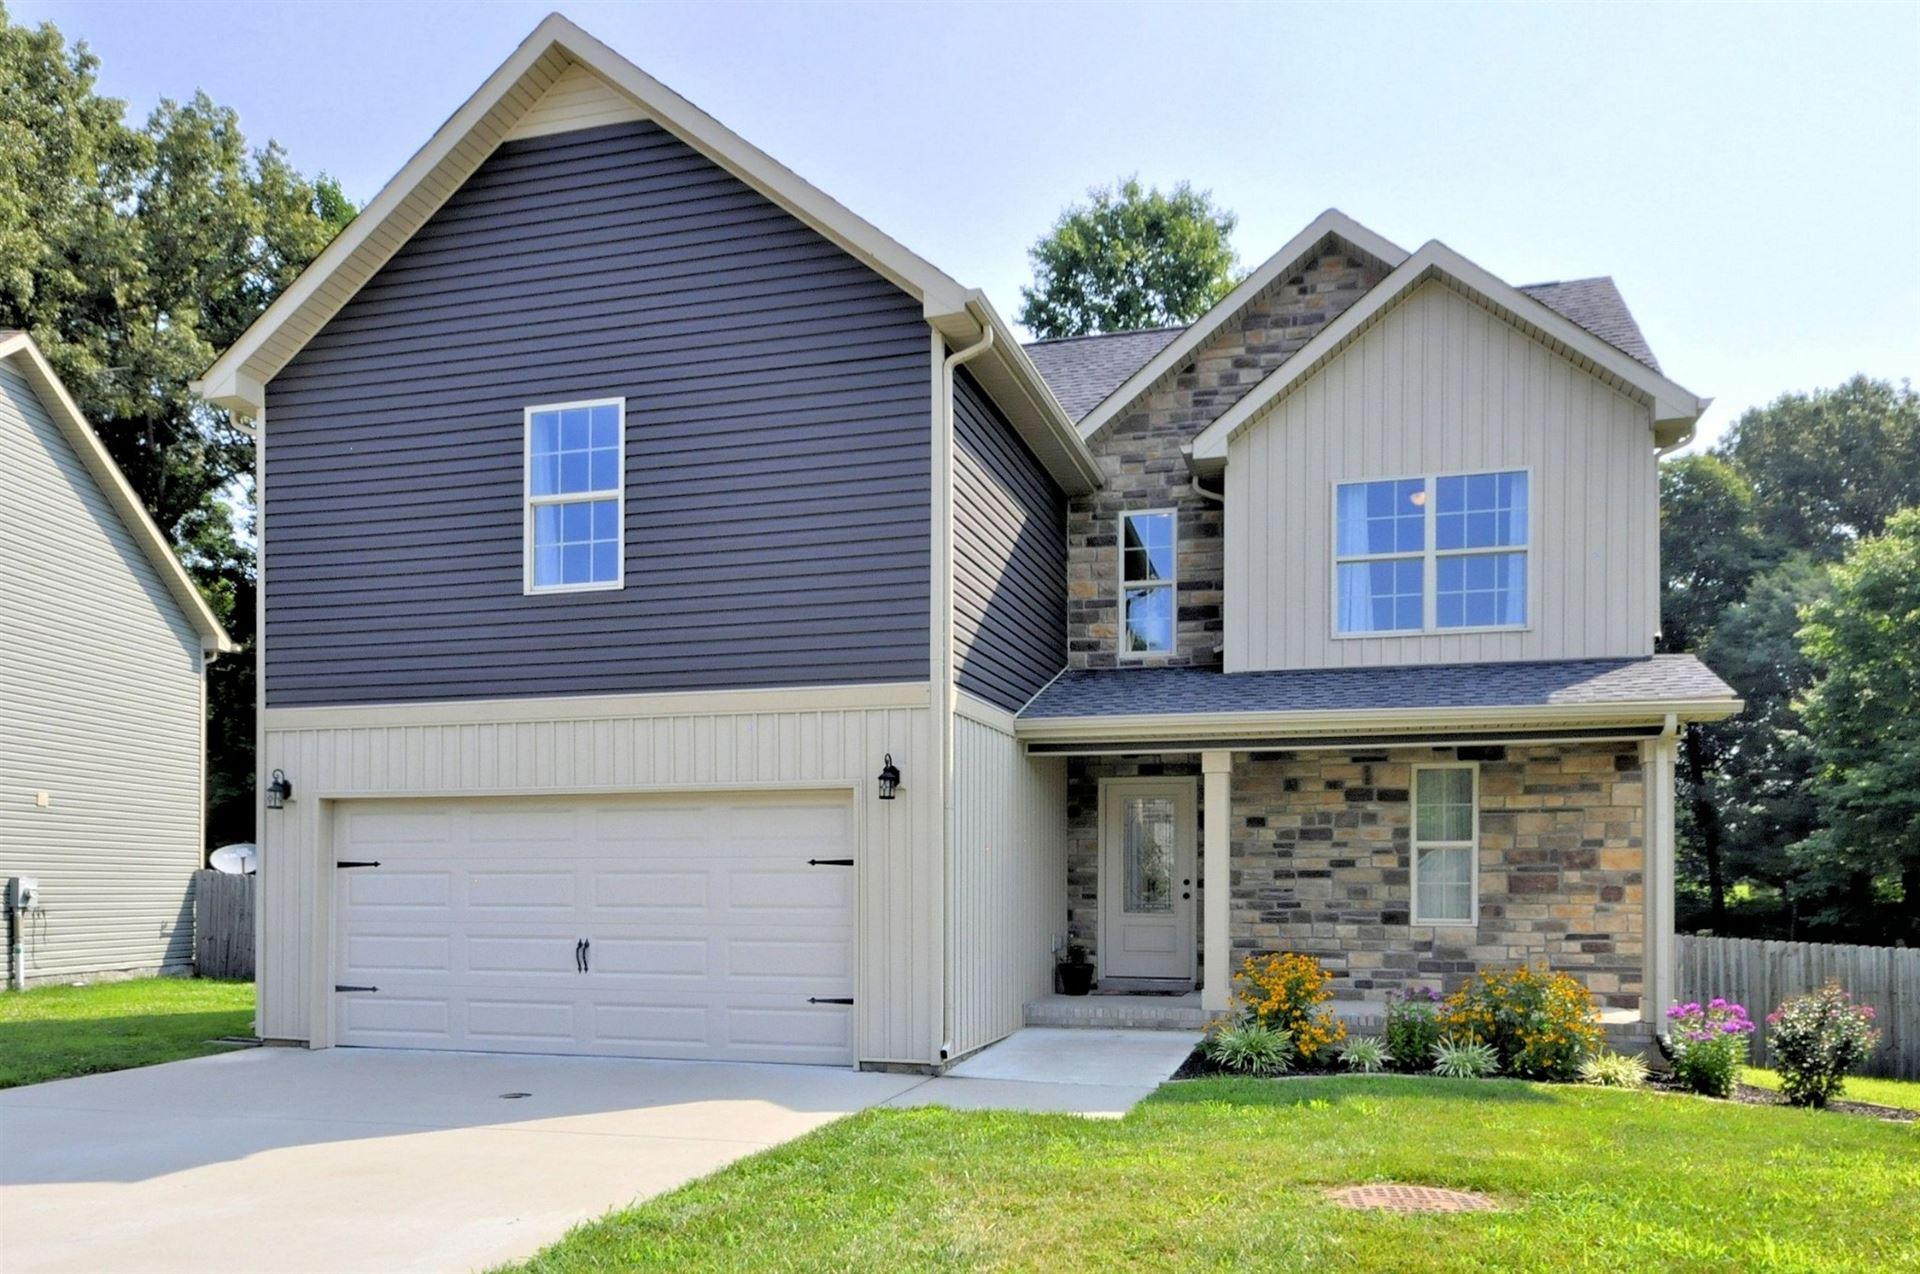 129 SYCAMORE HILL DRIVE, Clarksville, TN 37042 - MLS#: 2276376